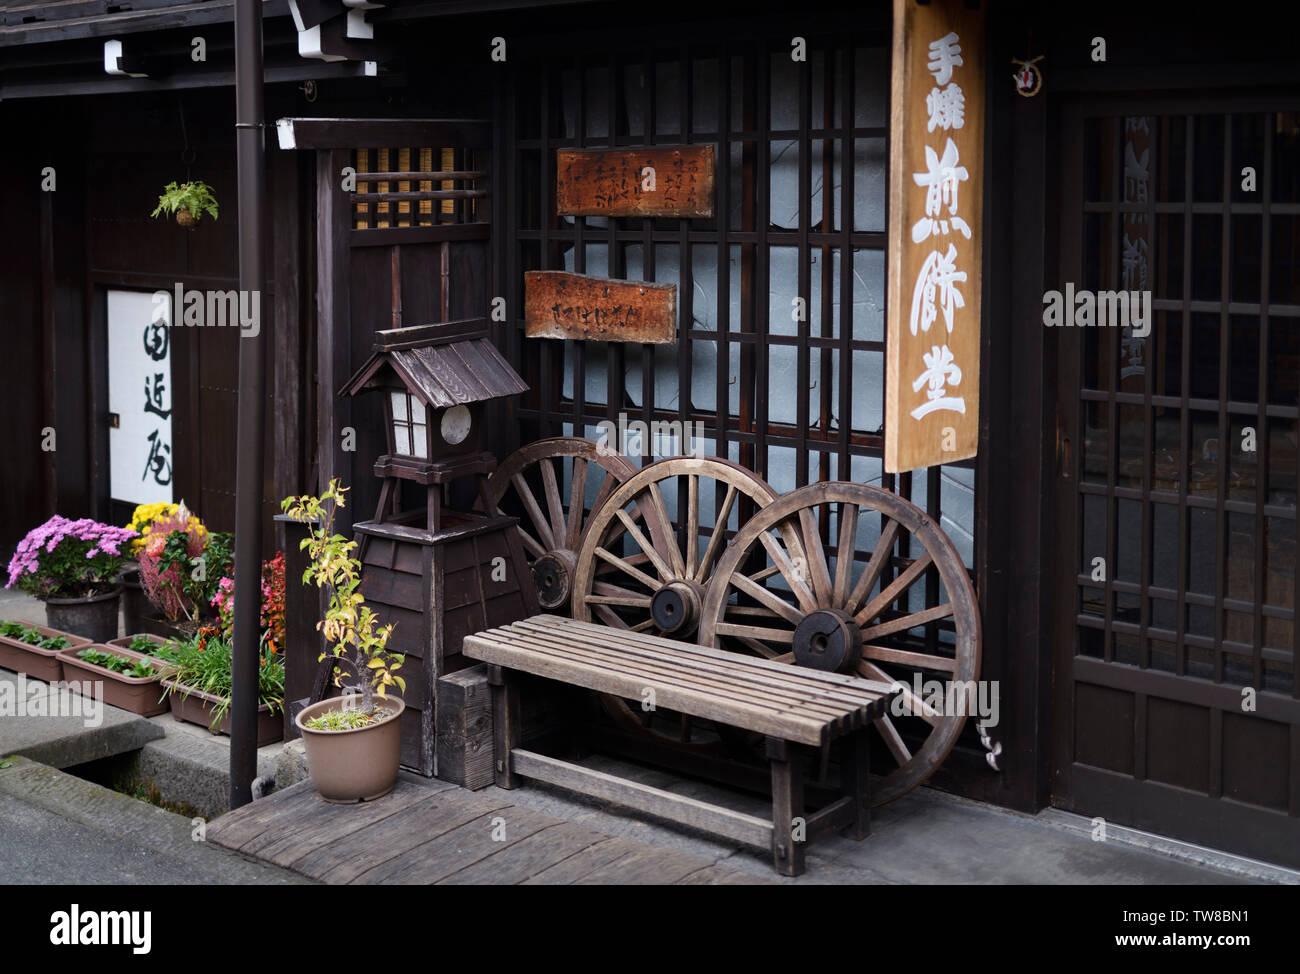 Beautifully decorated historic traditional houses at Takayama old town street. Japan, Takayama - Stock Image